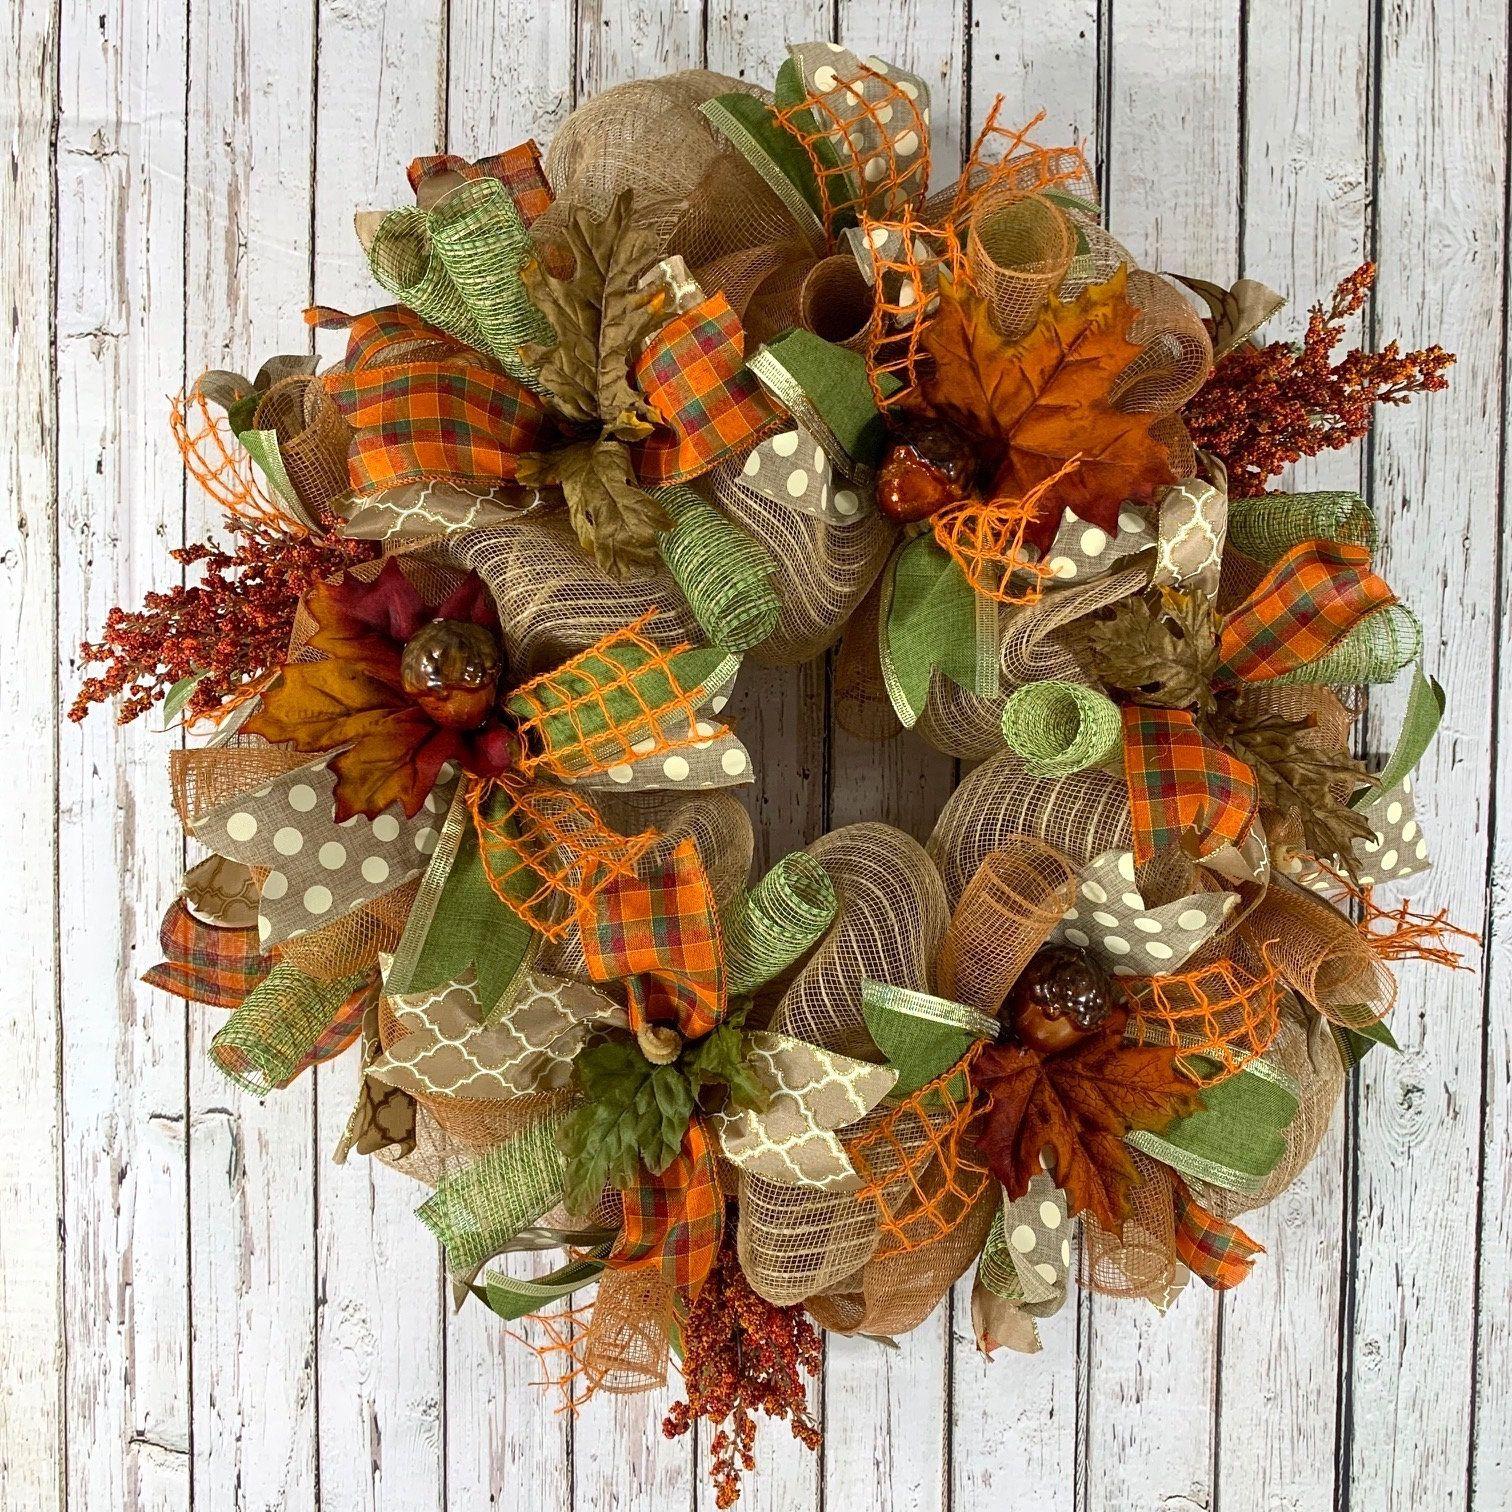 Fall Wreath With Acorns